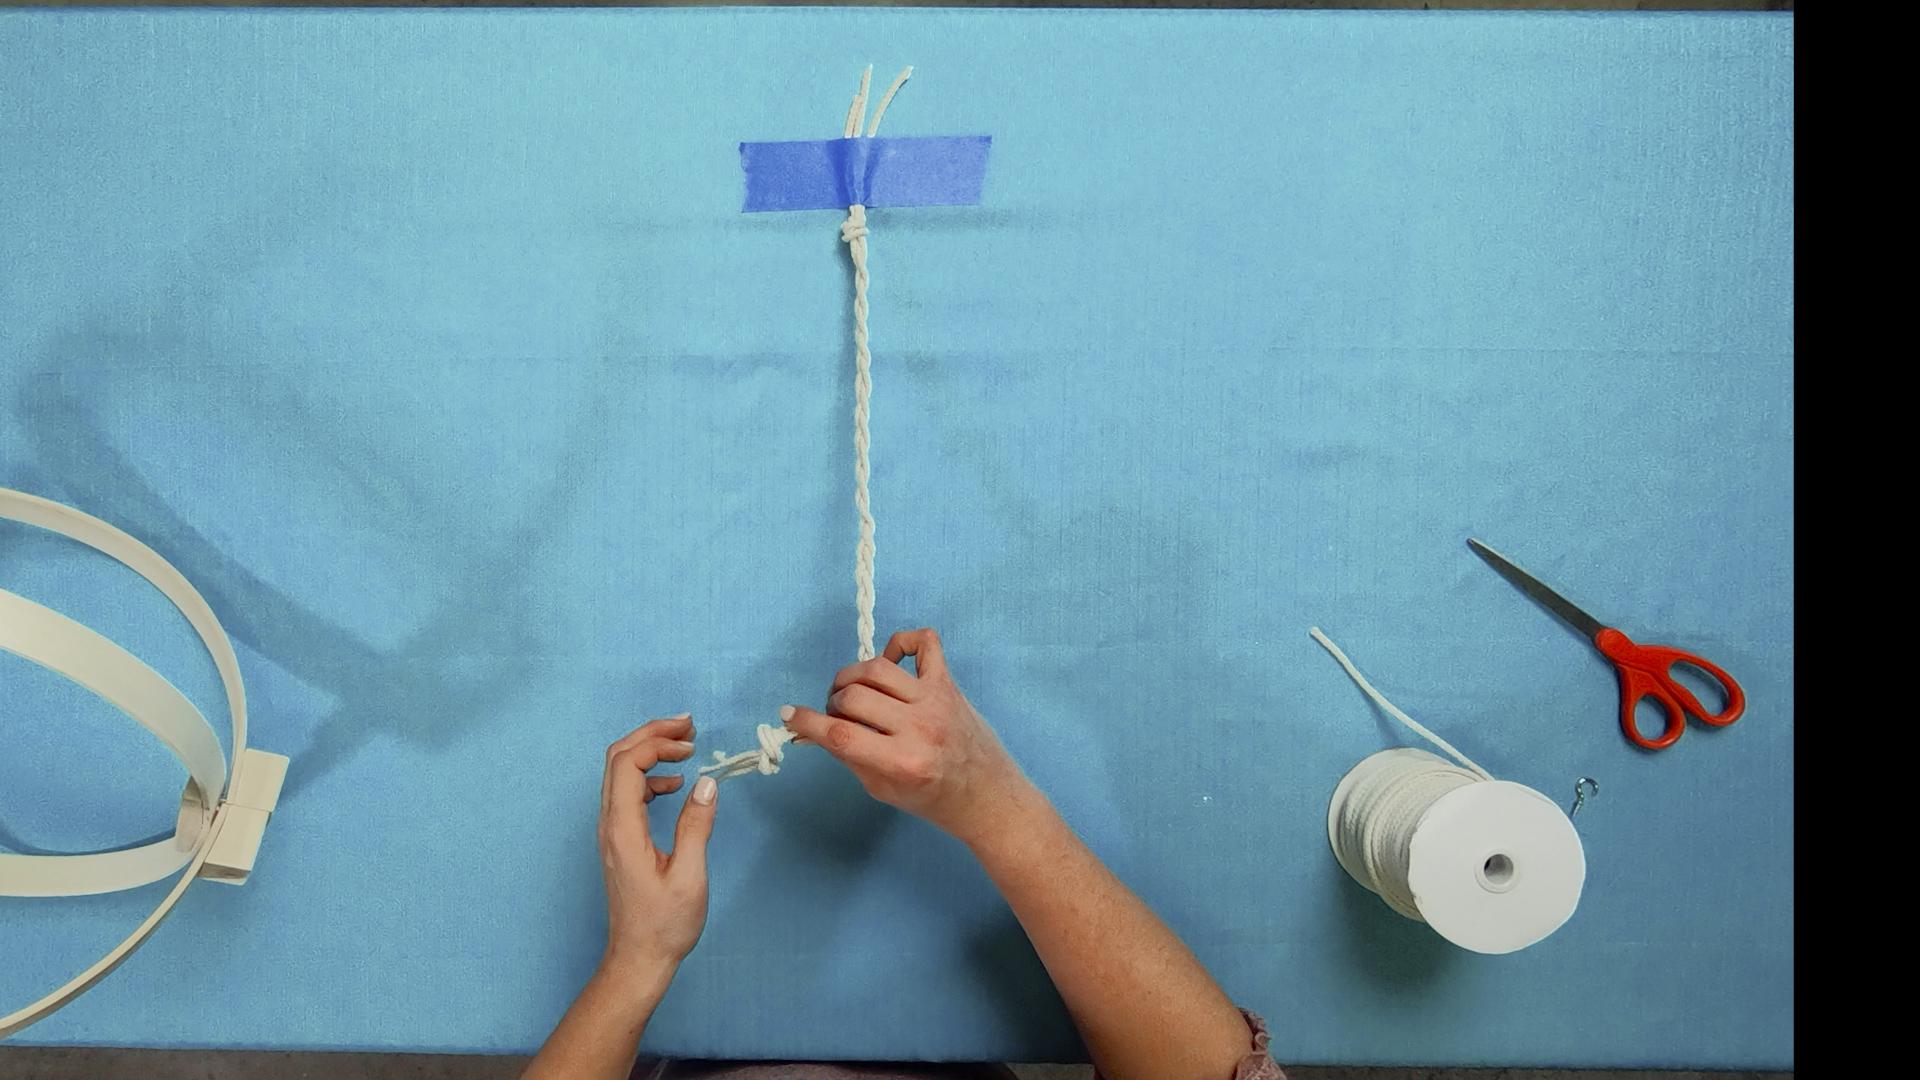 braiding macrame cord for boho hanging planter